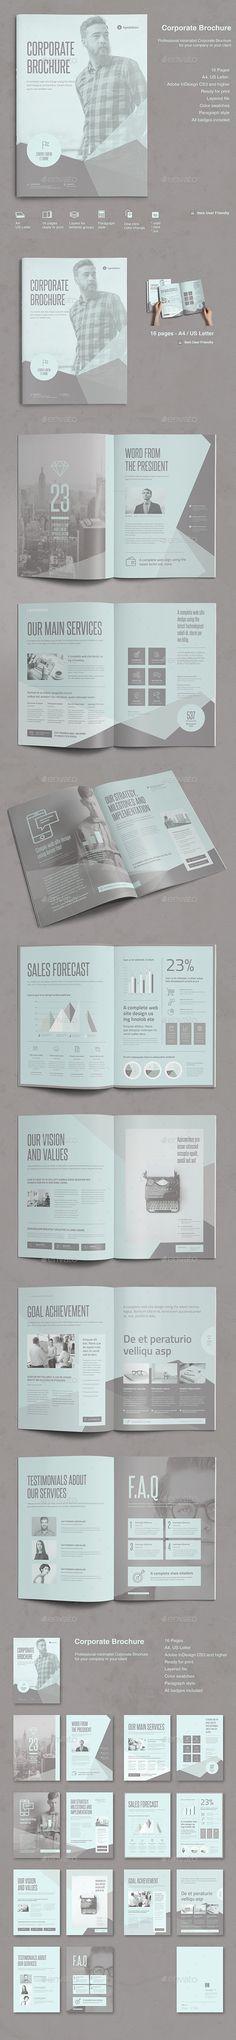 Corporate Brochure Template InDesign INDD, AI Illustrator